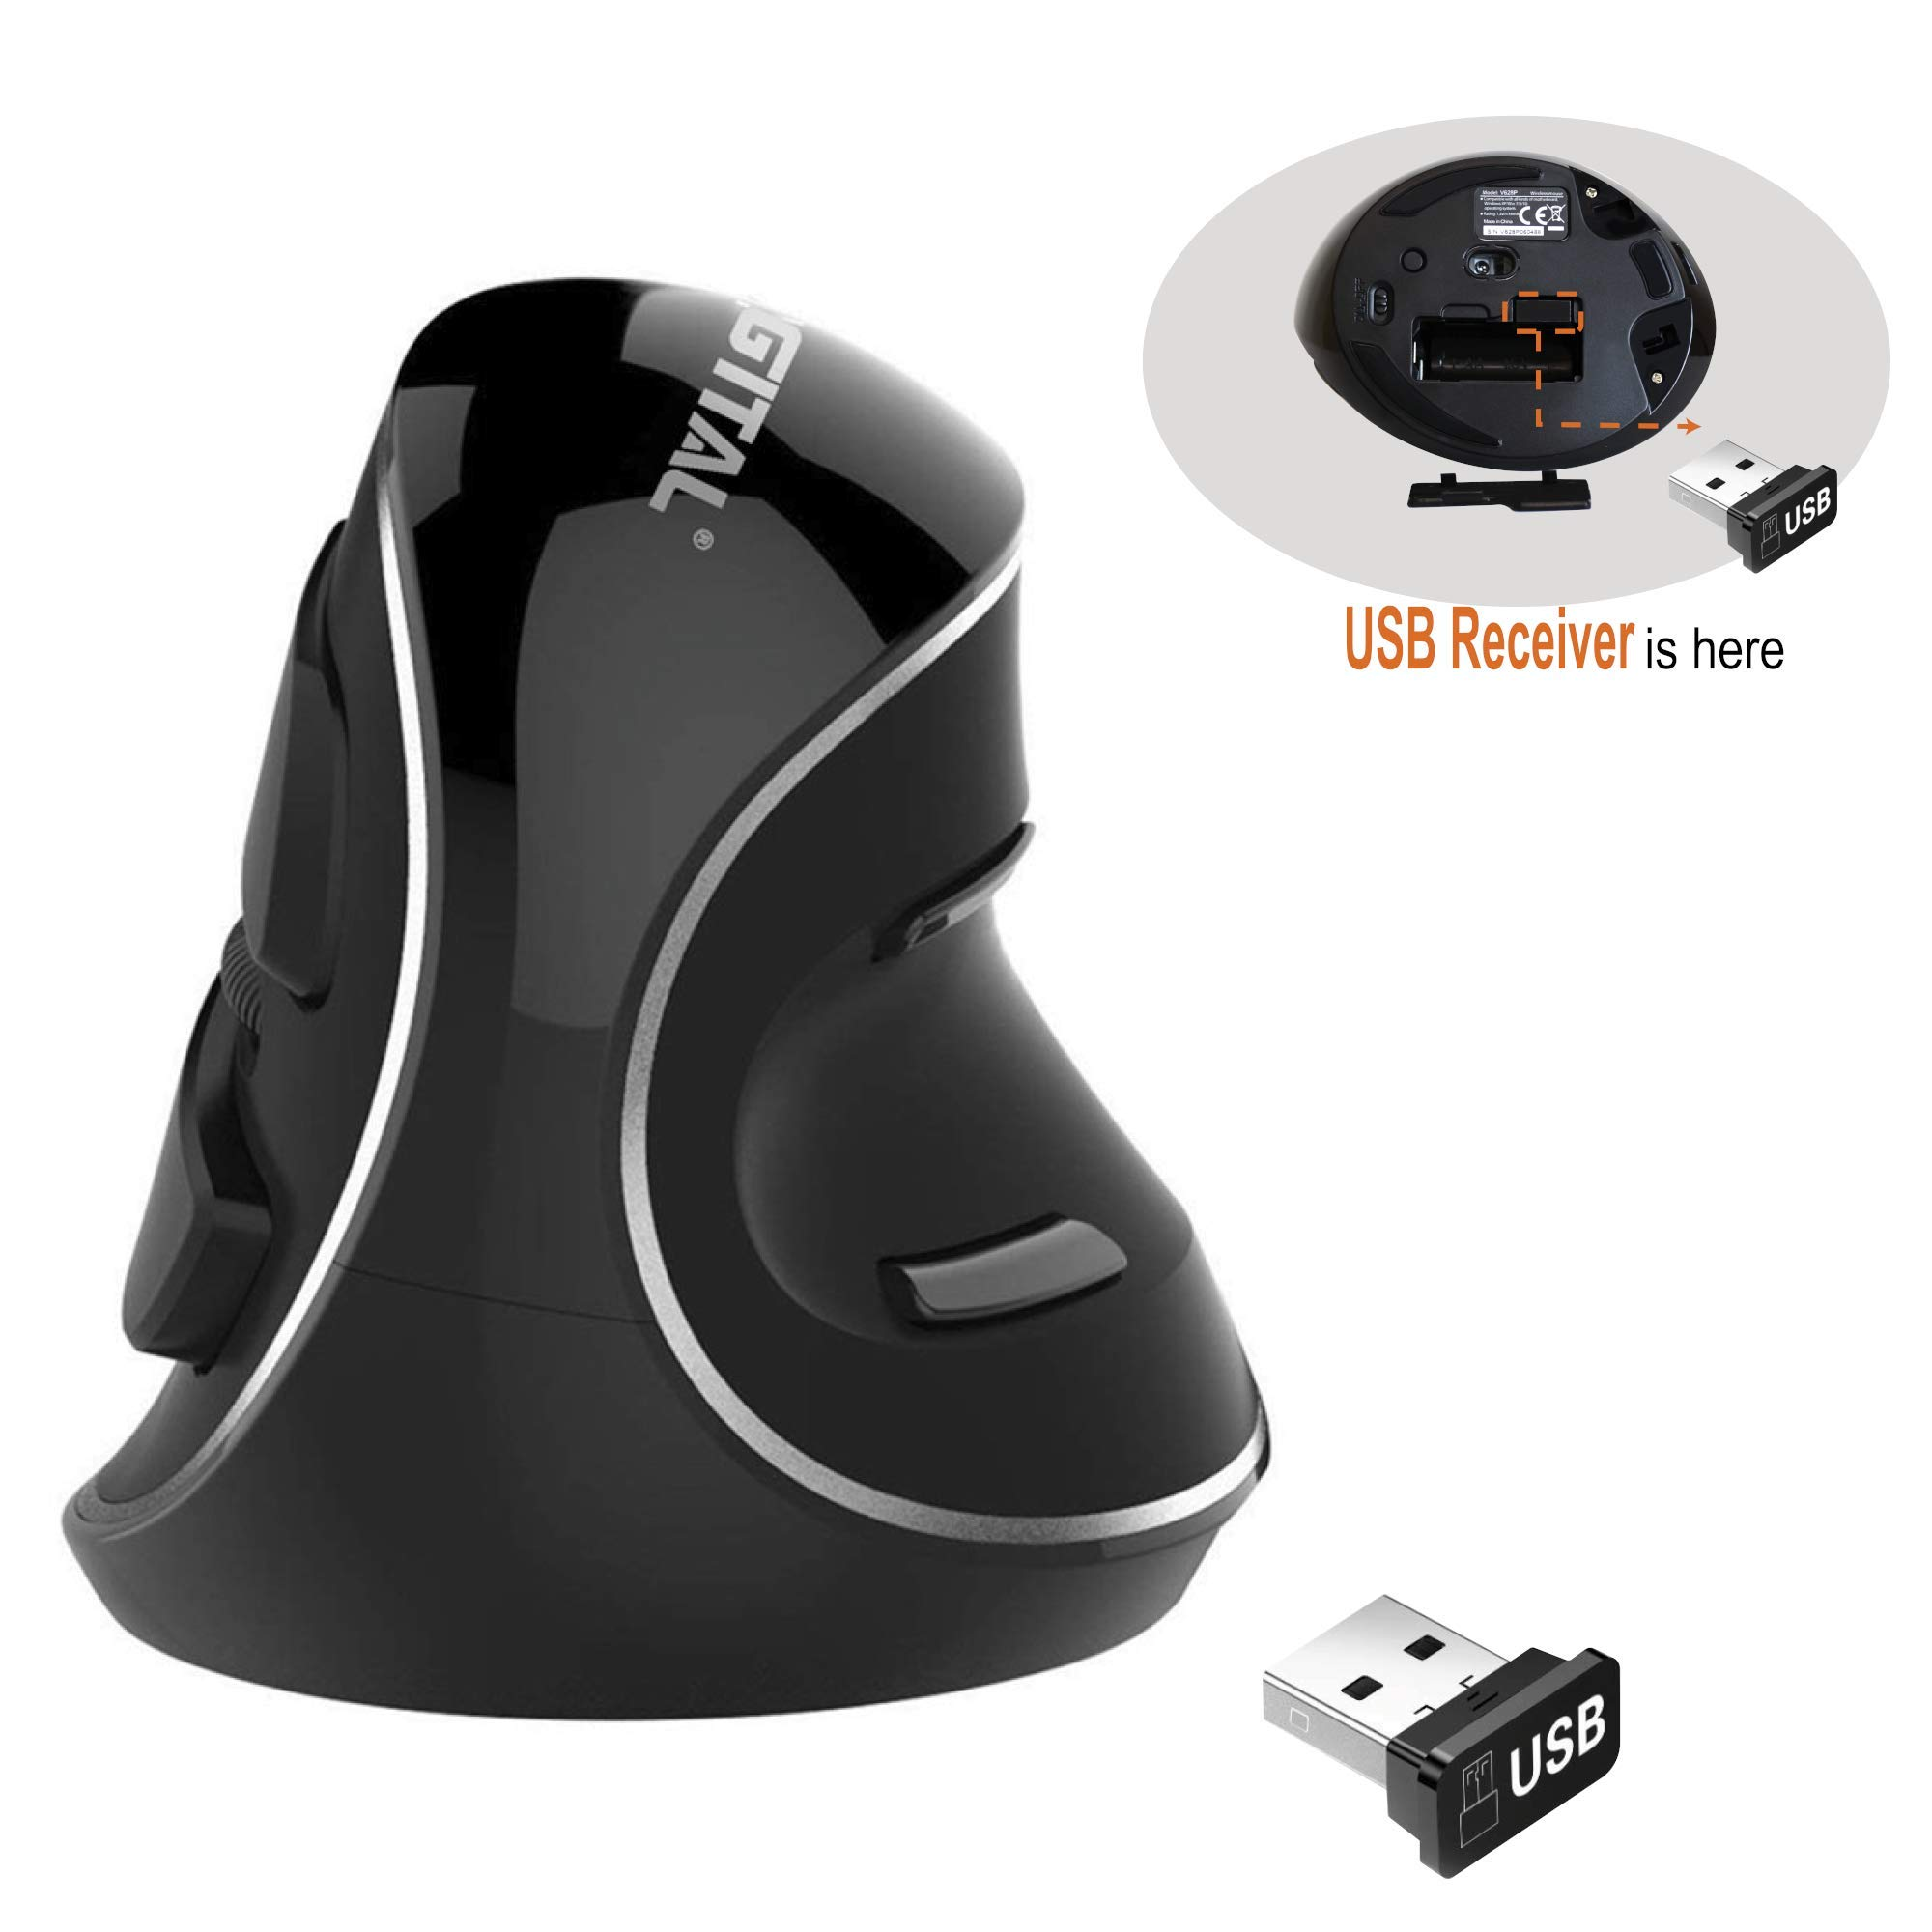 J-Tech Digital Wireless Ergonomic Vertical USB Mouse with Adjustable Sensitivity (600/1000/1600 DPI), Scroll Endurance, Removable Palm Rest & Thumb Buttons [V628P] by J-Tech Digital